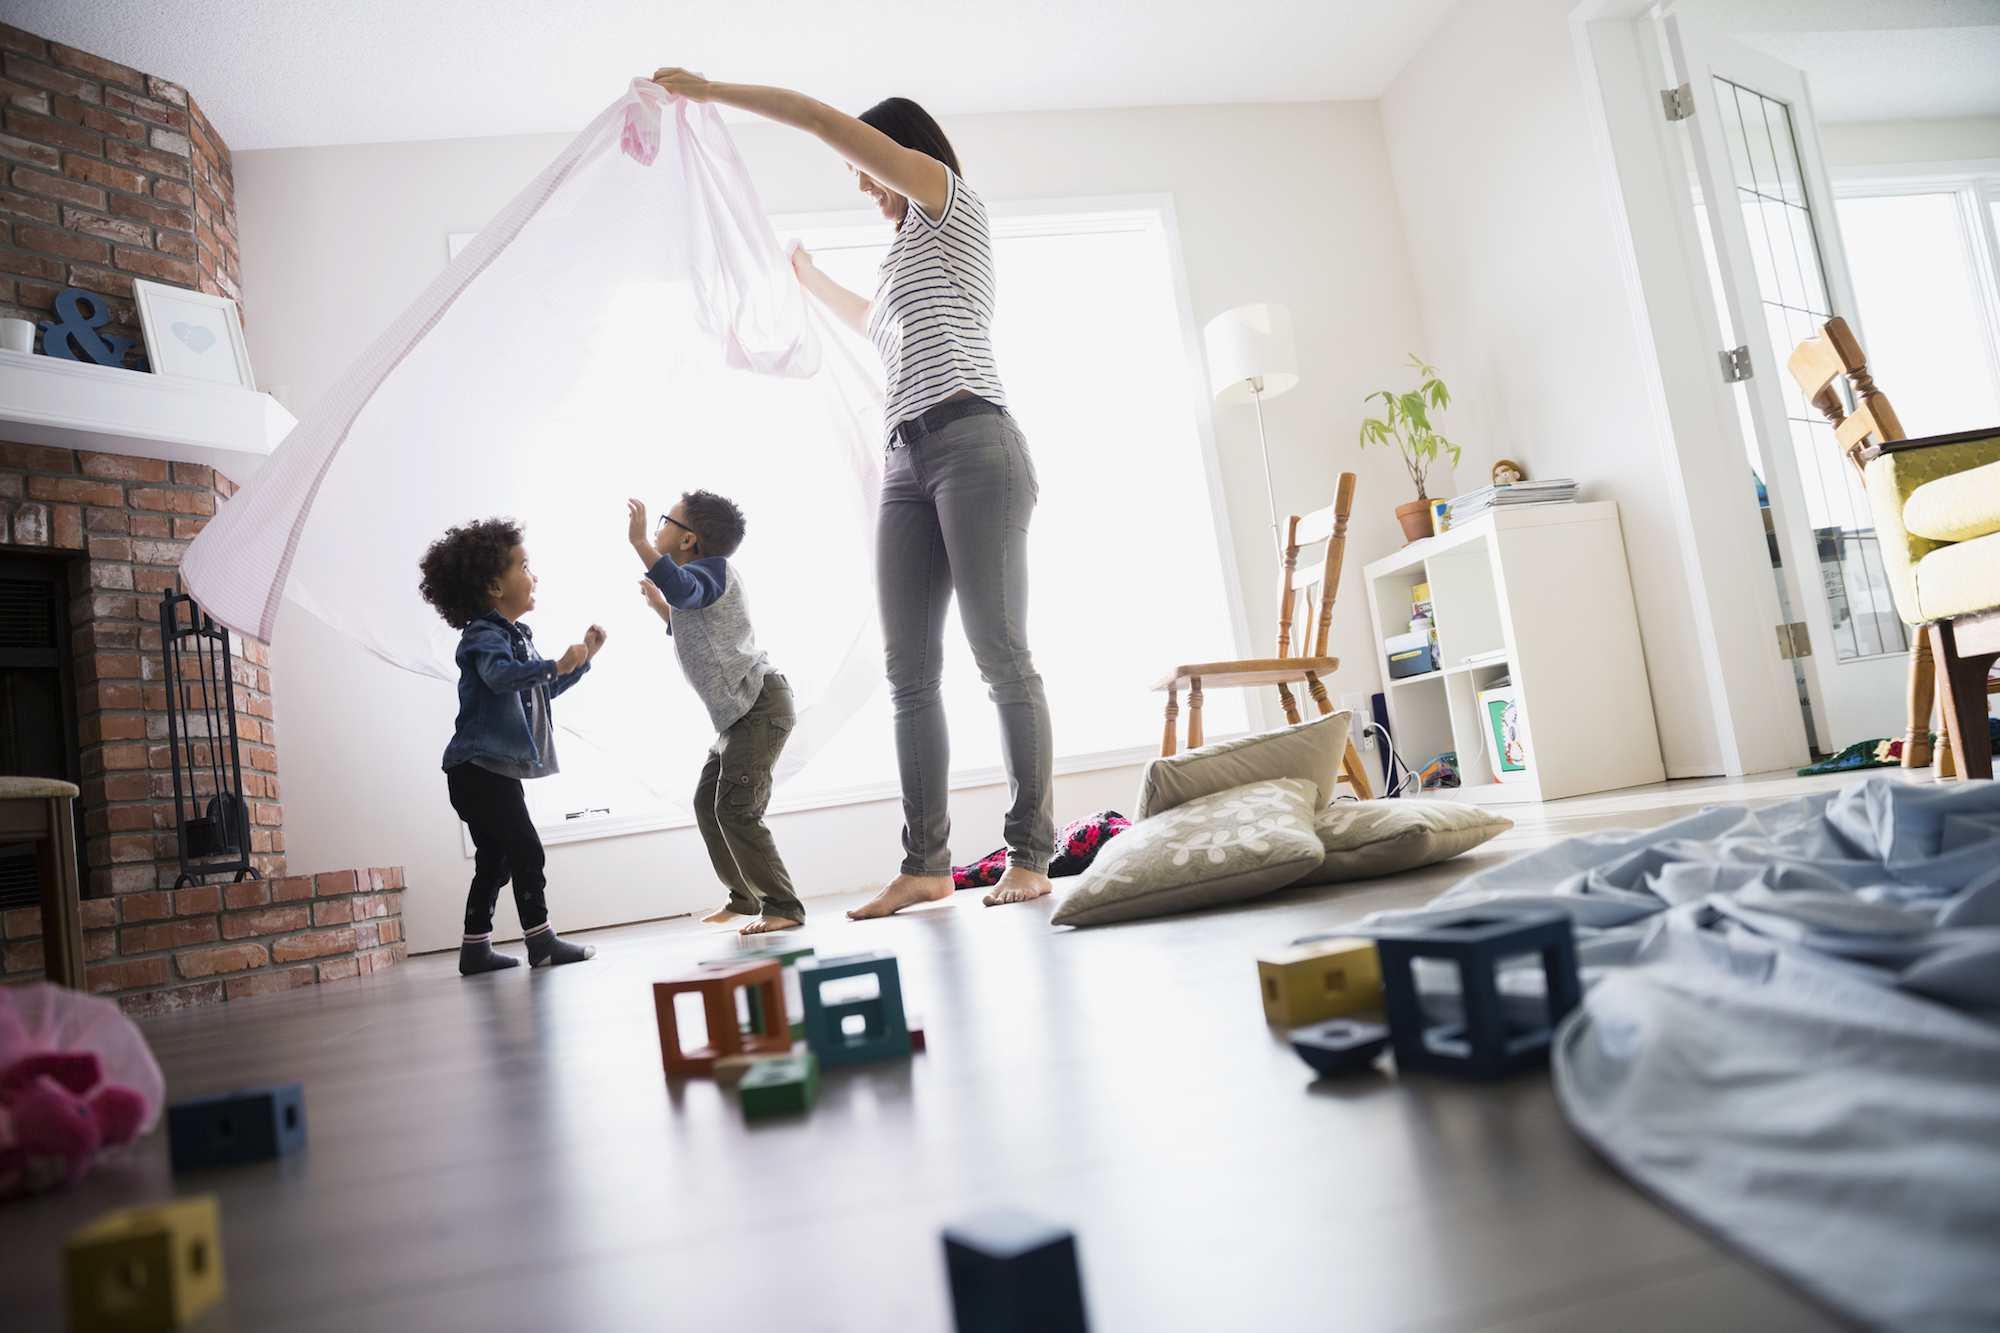 Children dancing under mother with sheet